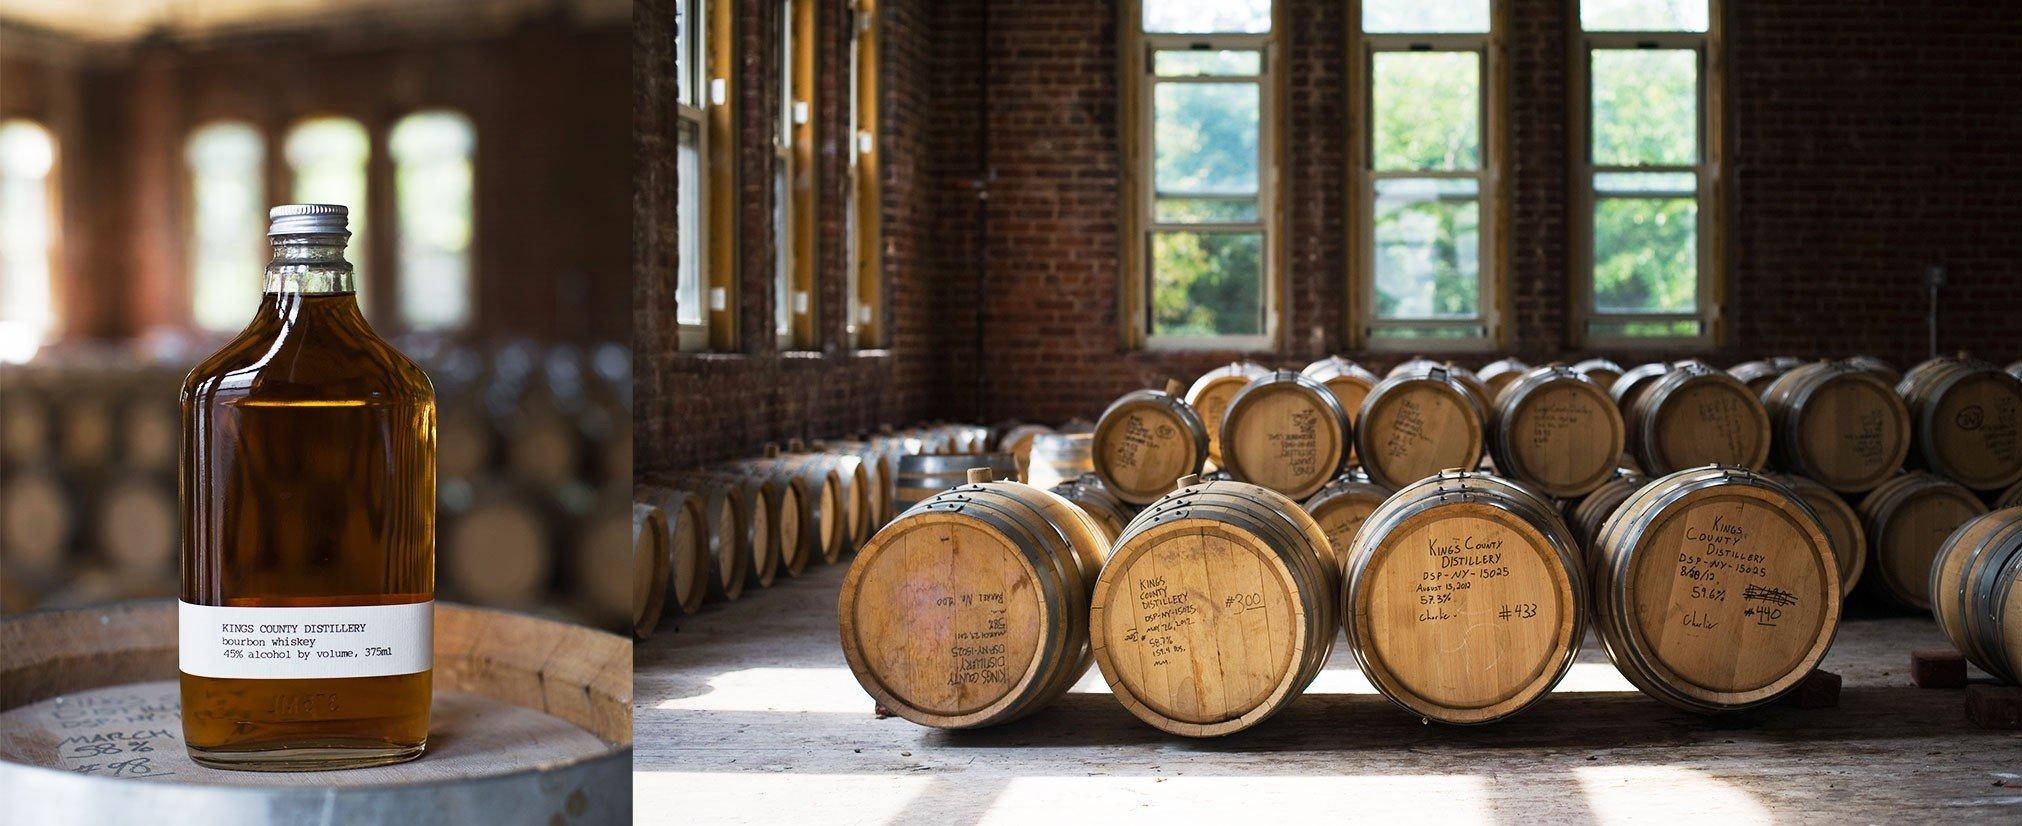 Food + Drink indoor window man made object vessel alcoholic beverage distilled beverage Drink wine wooden whisky Winery alcohol barrel several